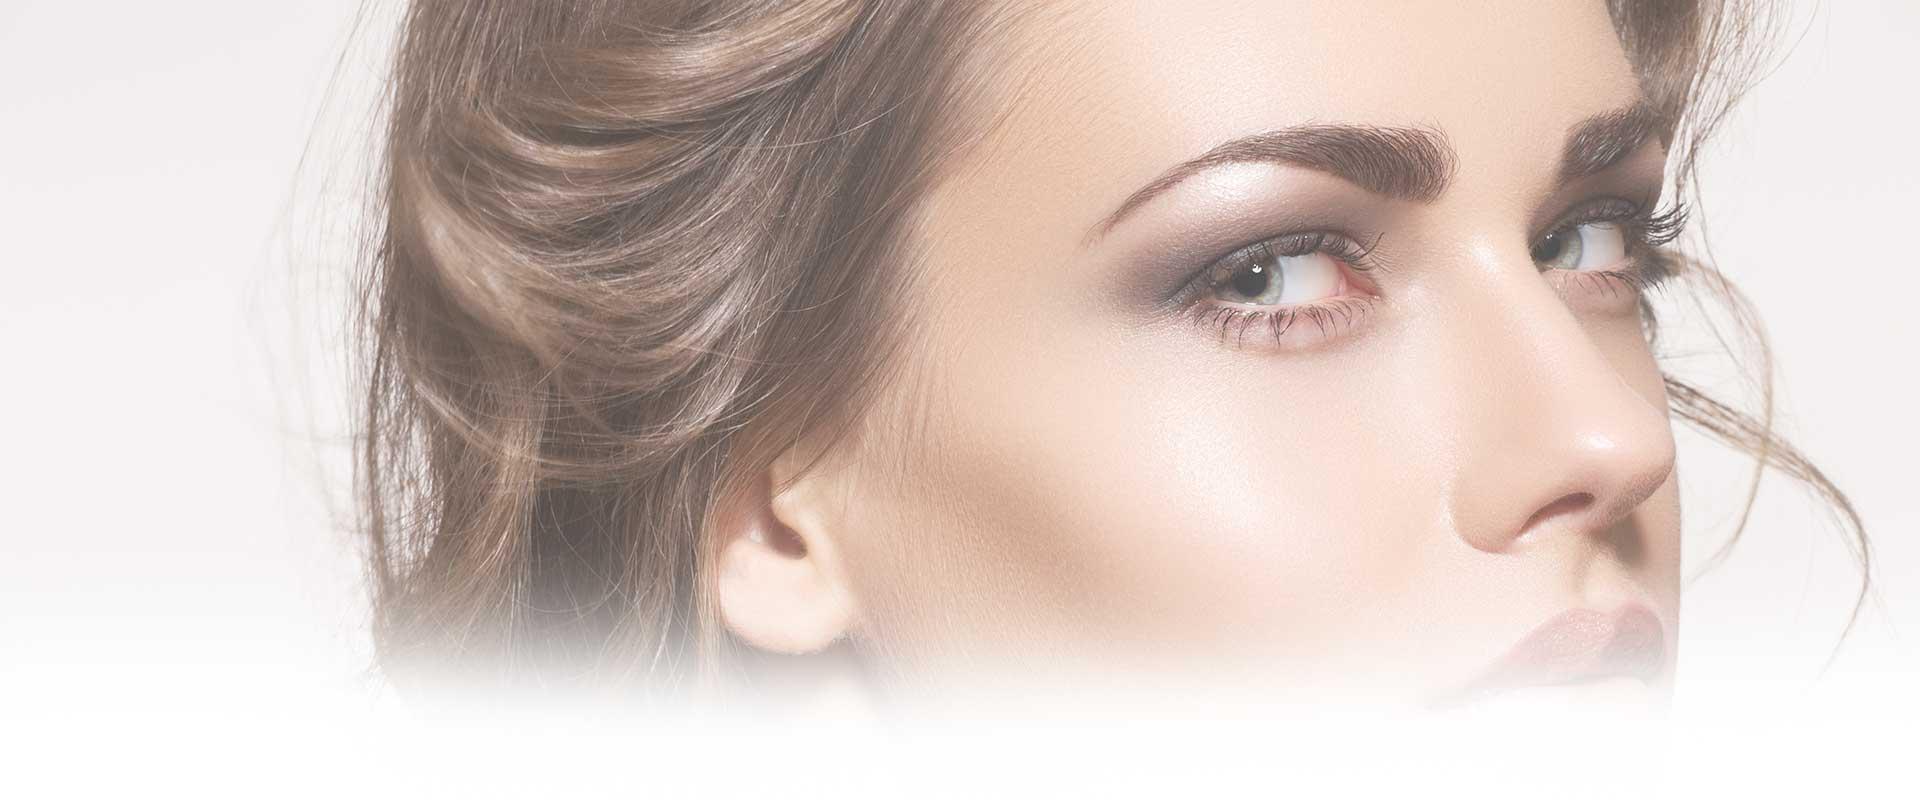 Eyebrow R Us Eyebrow Threading Services For Apple Valley